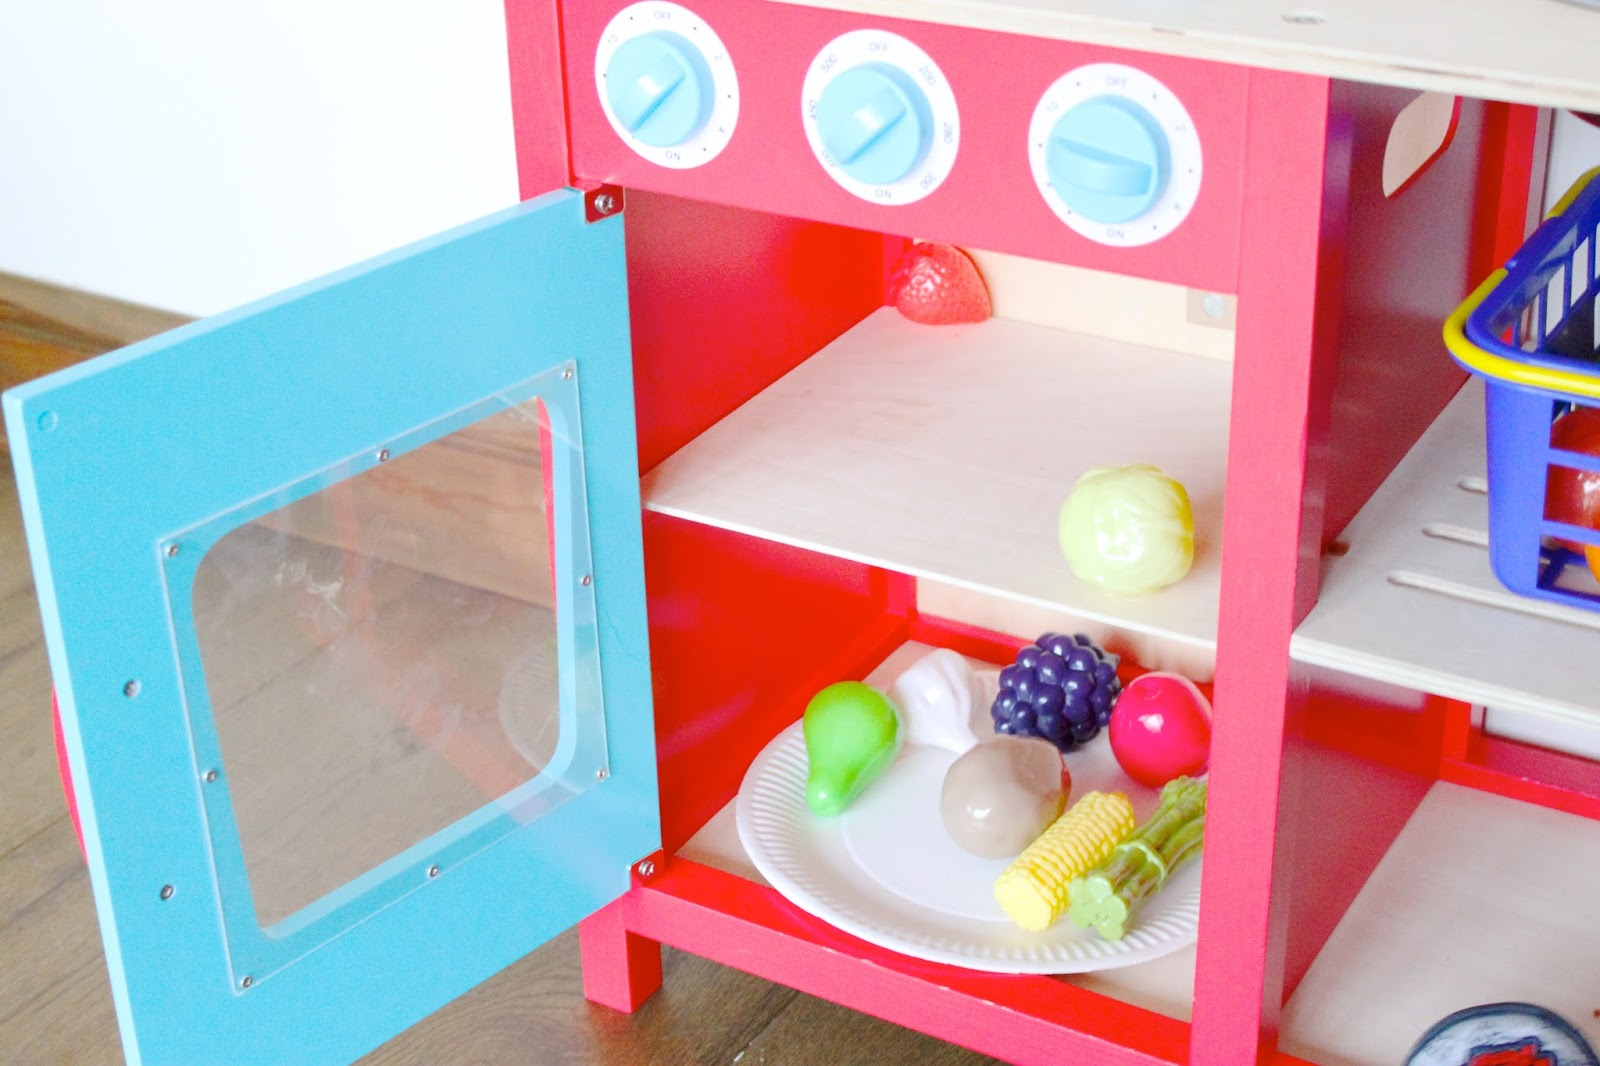 GTLC Cavendish Play Kitchen